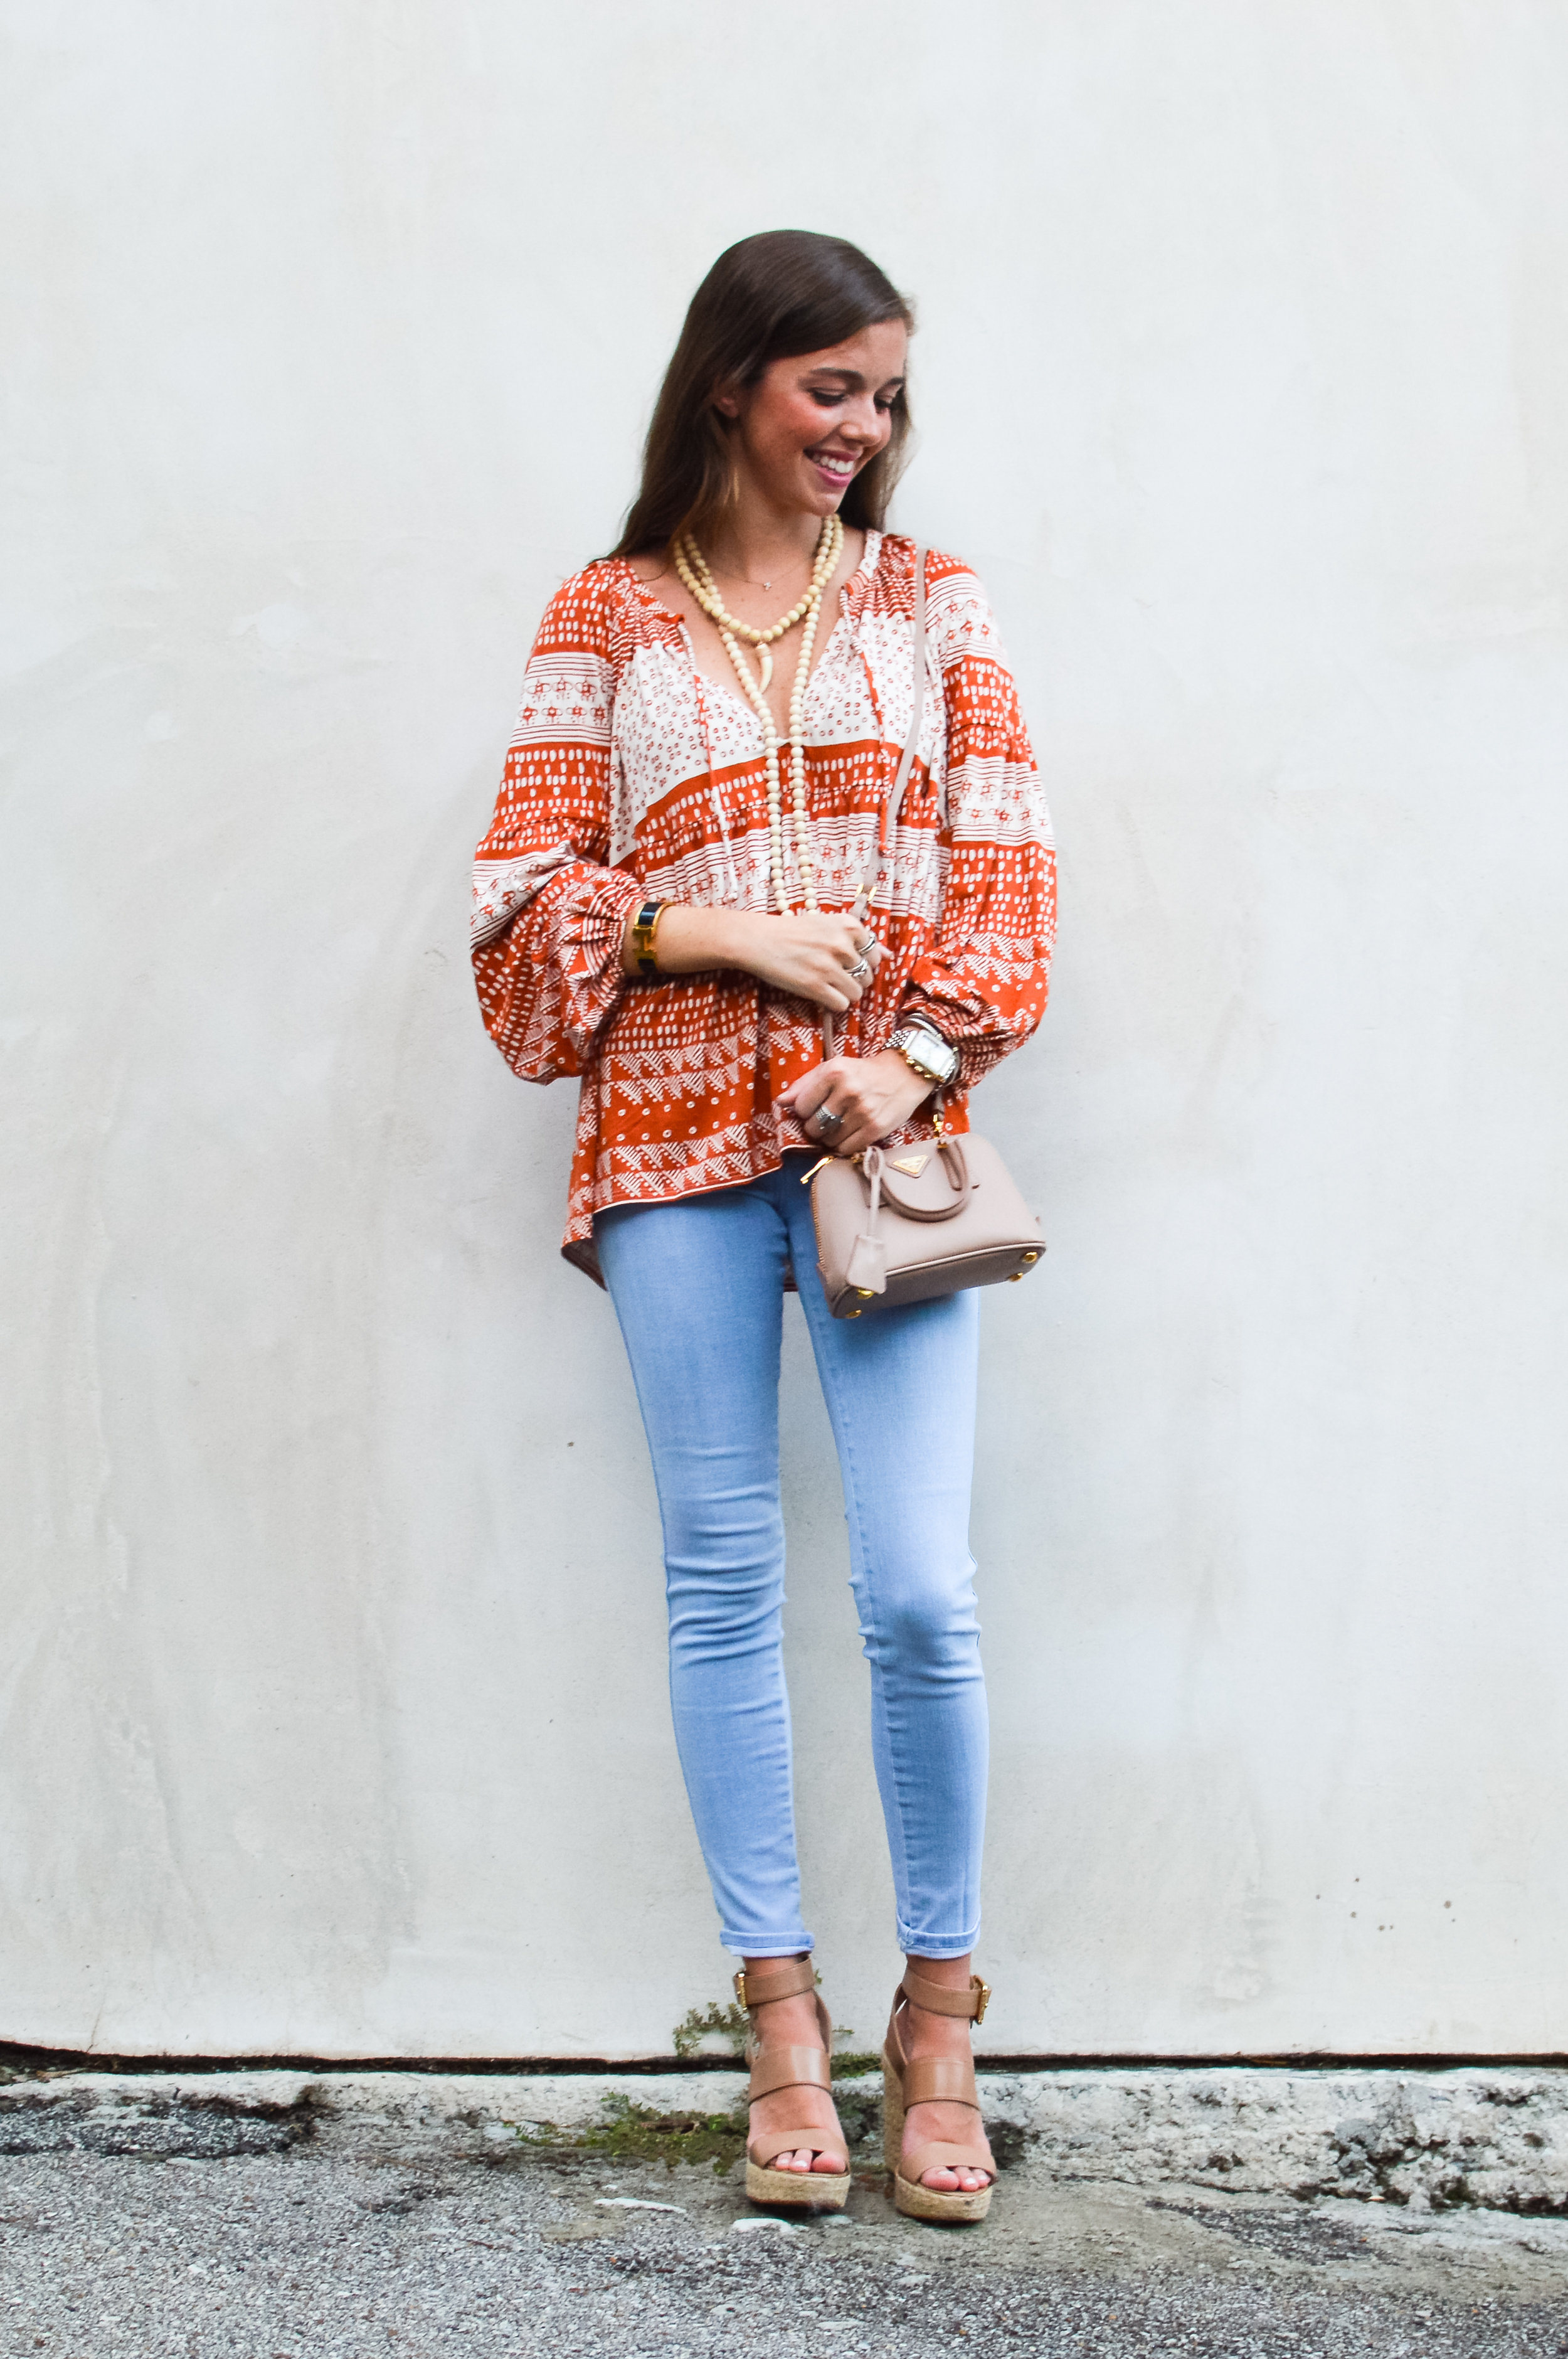 fashion blogger lcb style rachel pally (13 of 18).jpg